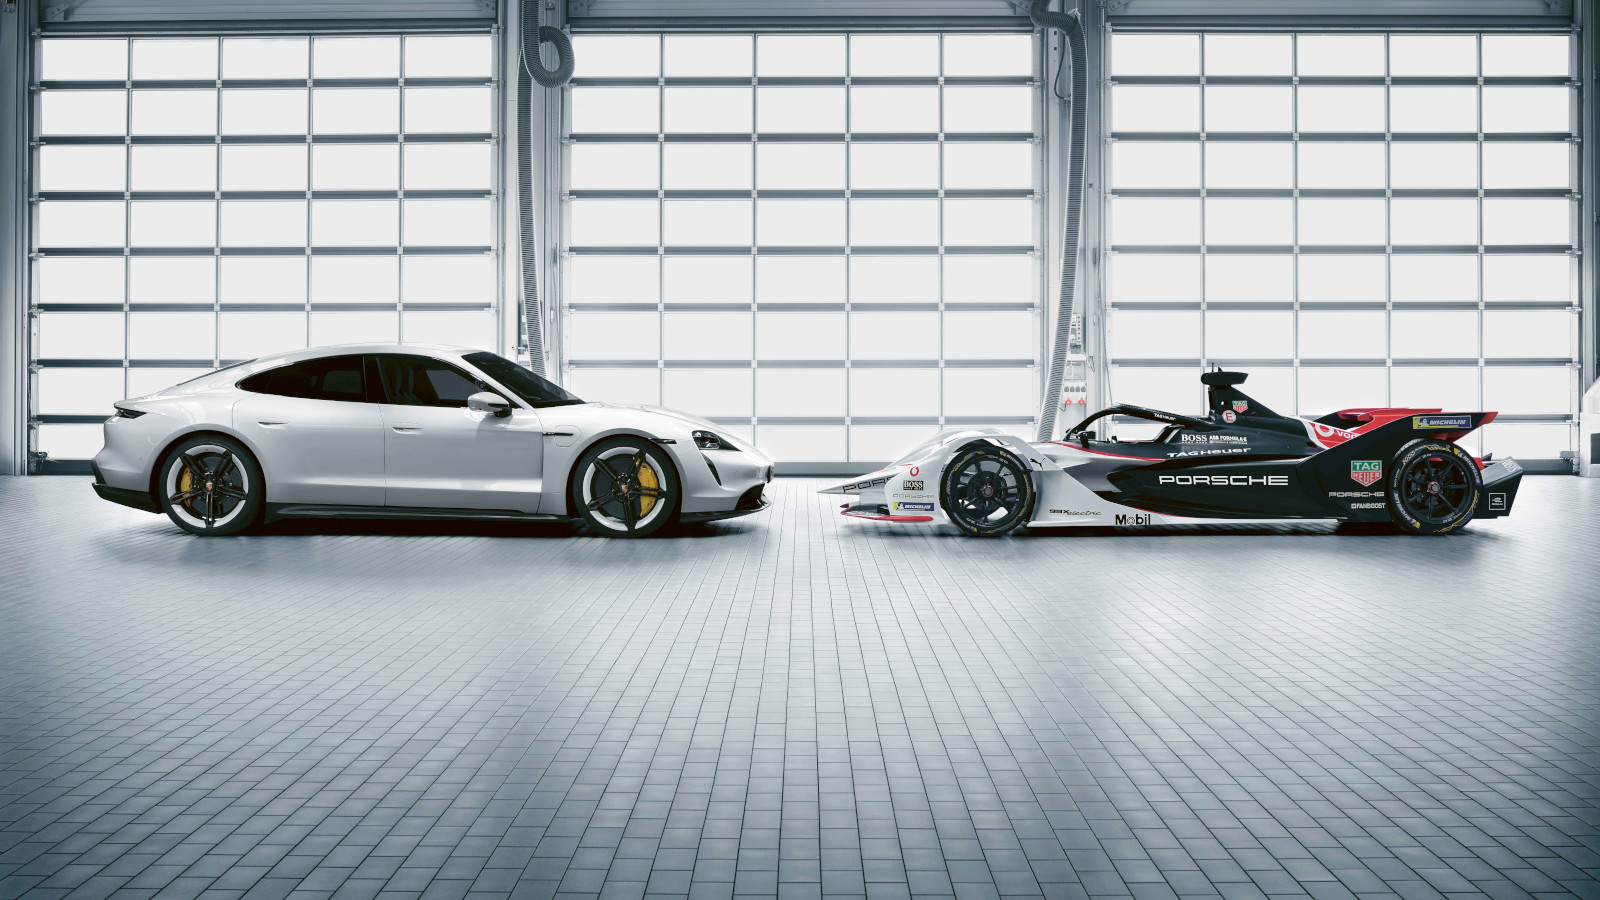 De la Fórmula E a las calles, la innovación de Porsche